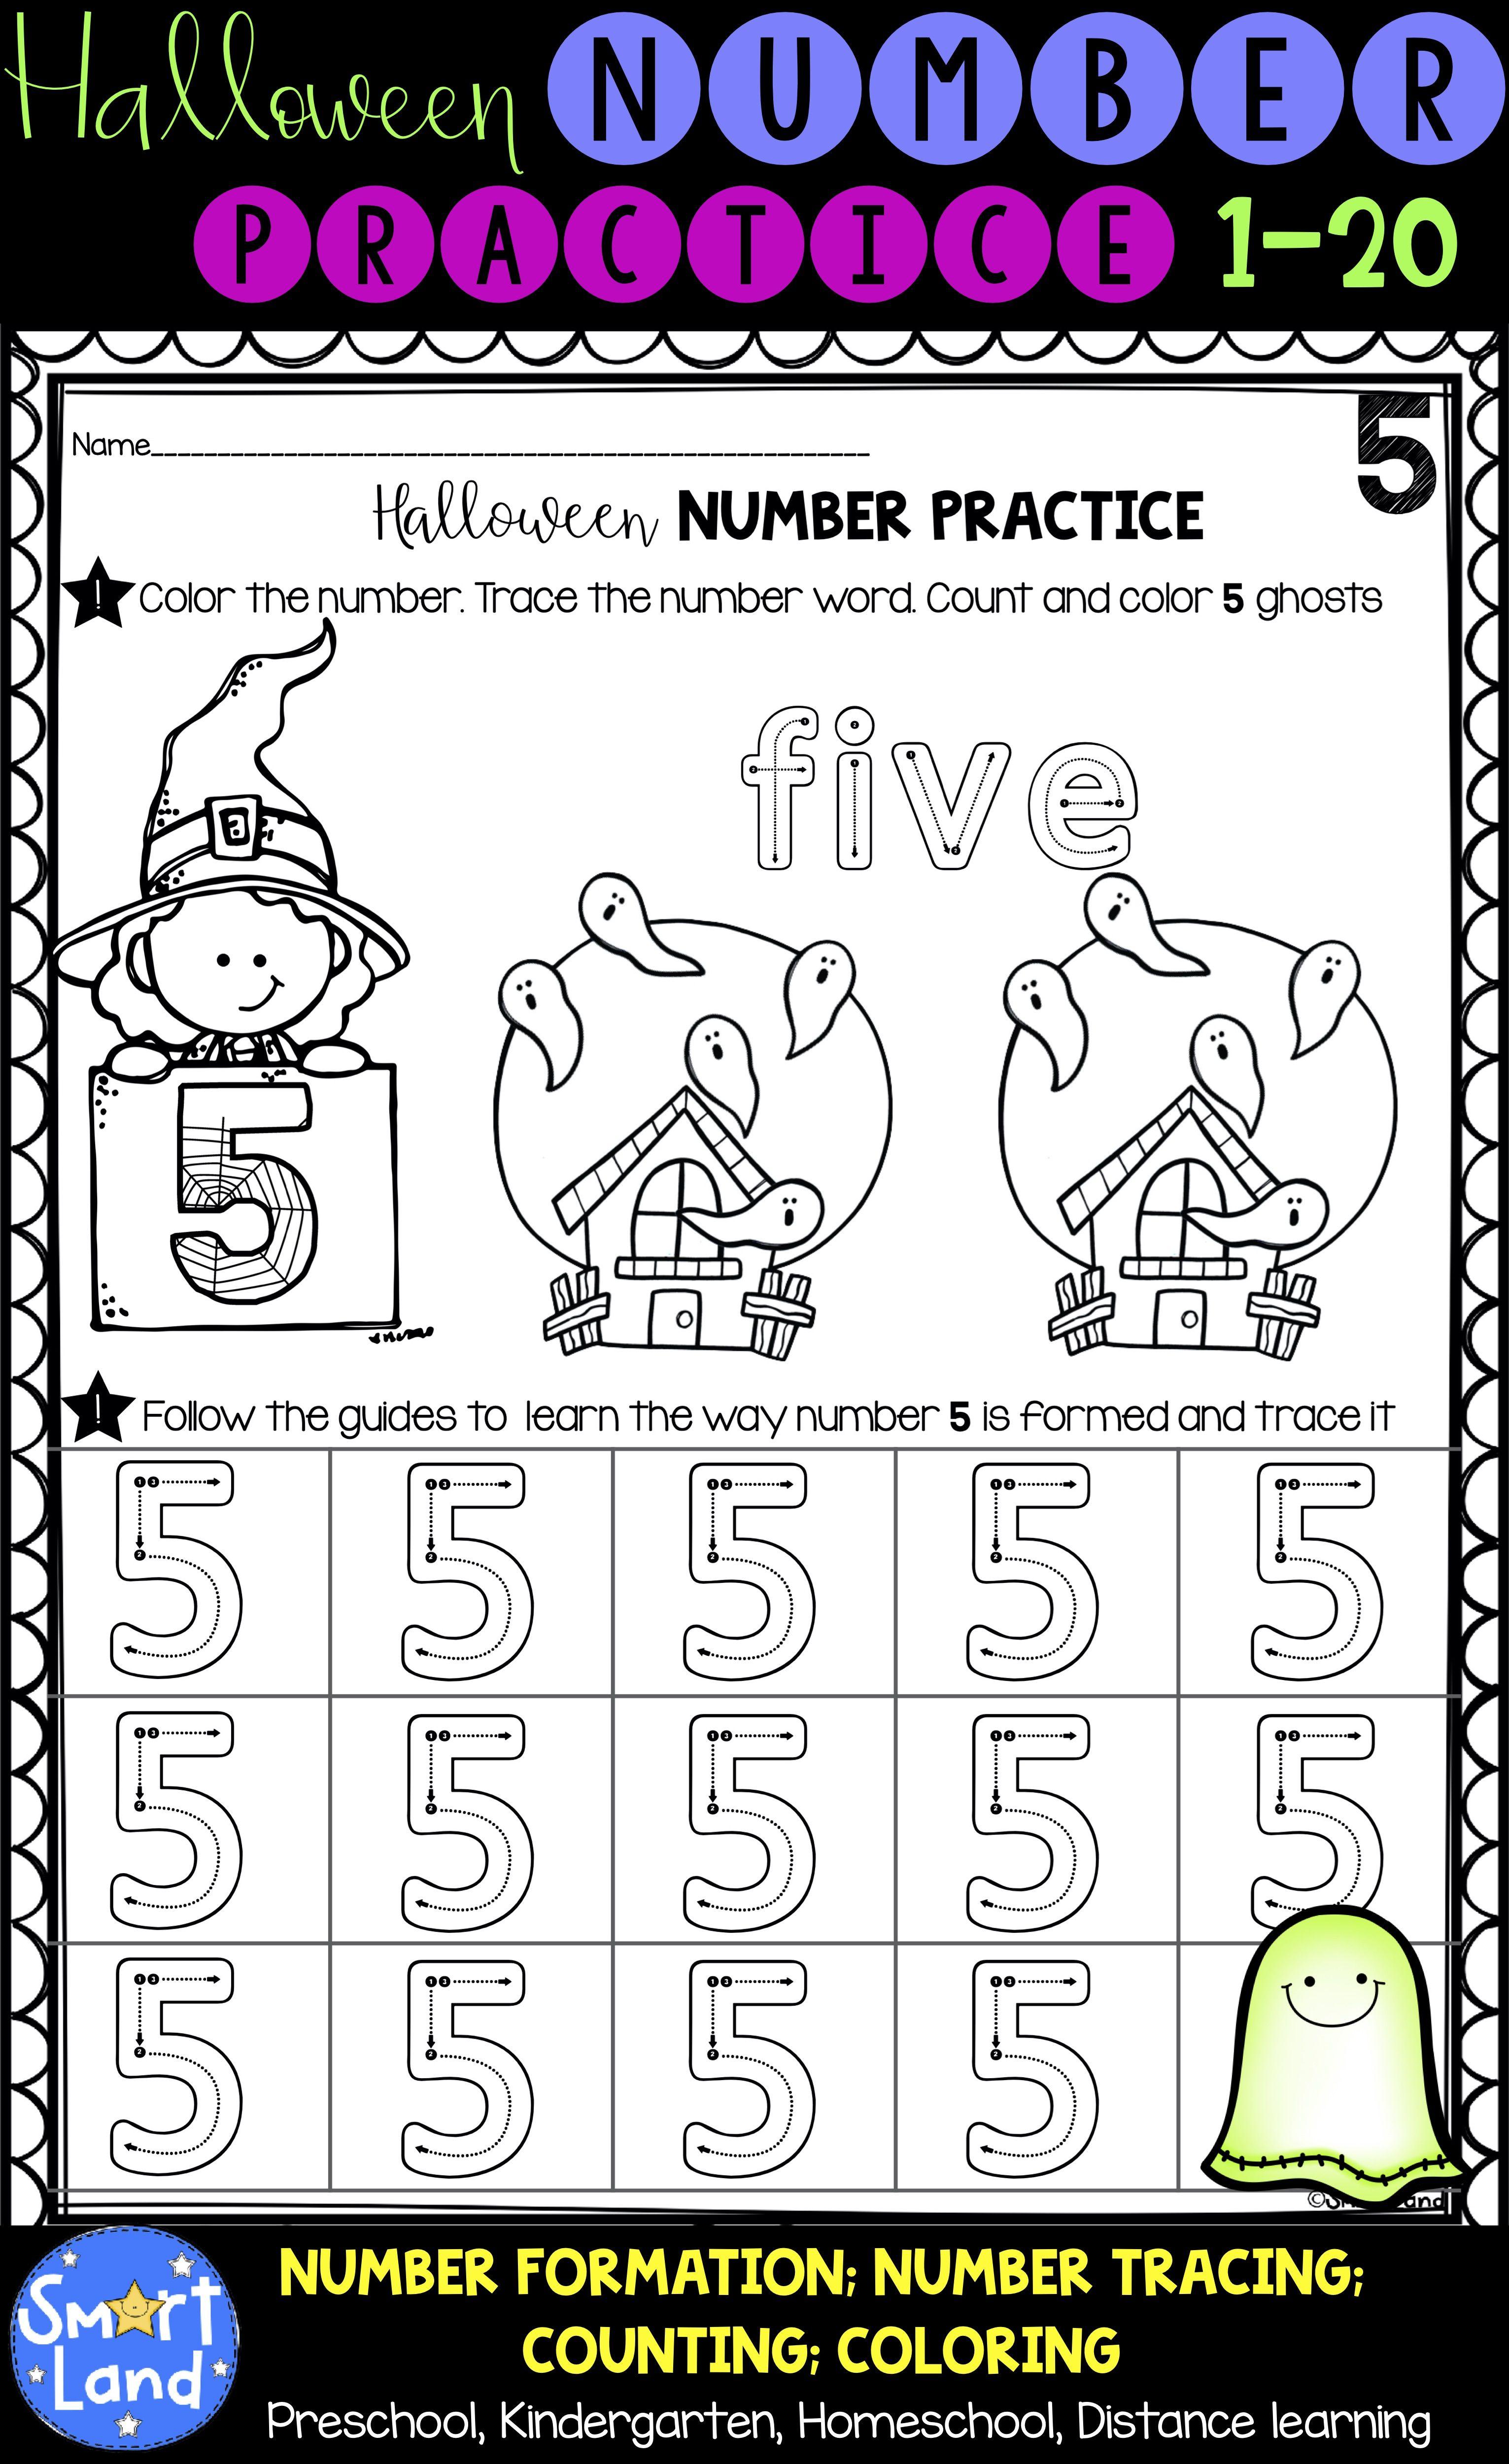 Halloween Numbers 1 20 Handwriting And Counting Worksheets Halloween Worksheets Fall Preschool Activities Preschool Math Worksheets [ 5000 x 3062 Pixel ]